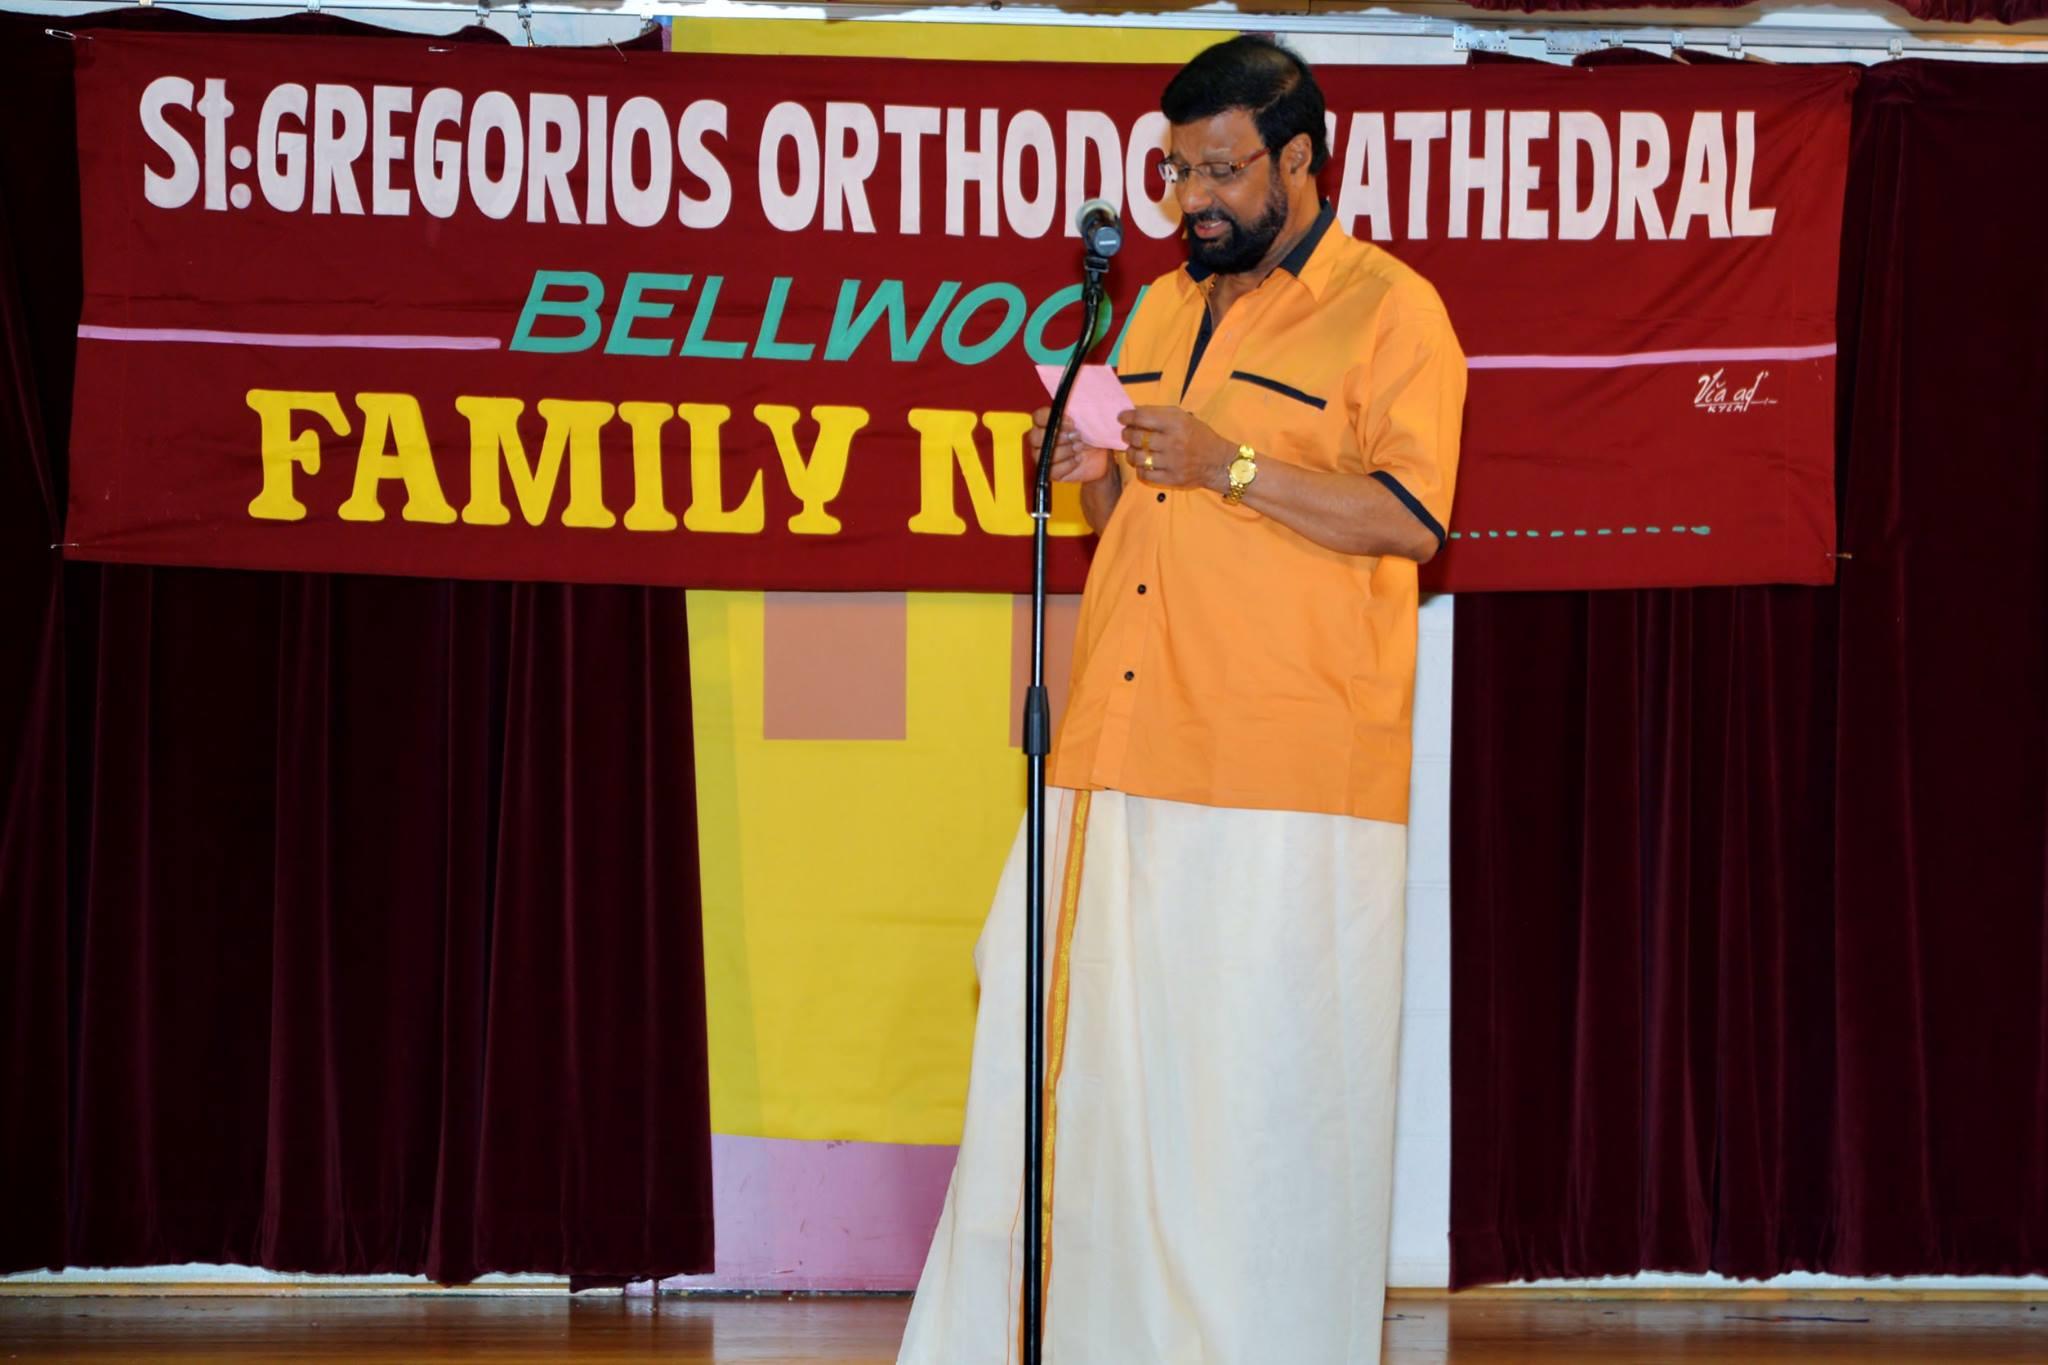 Family Night 2017 at St Demetrios Greek Orthodox Church, Elmhurst IL on May 27th, 2017